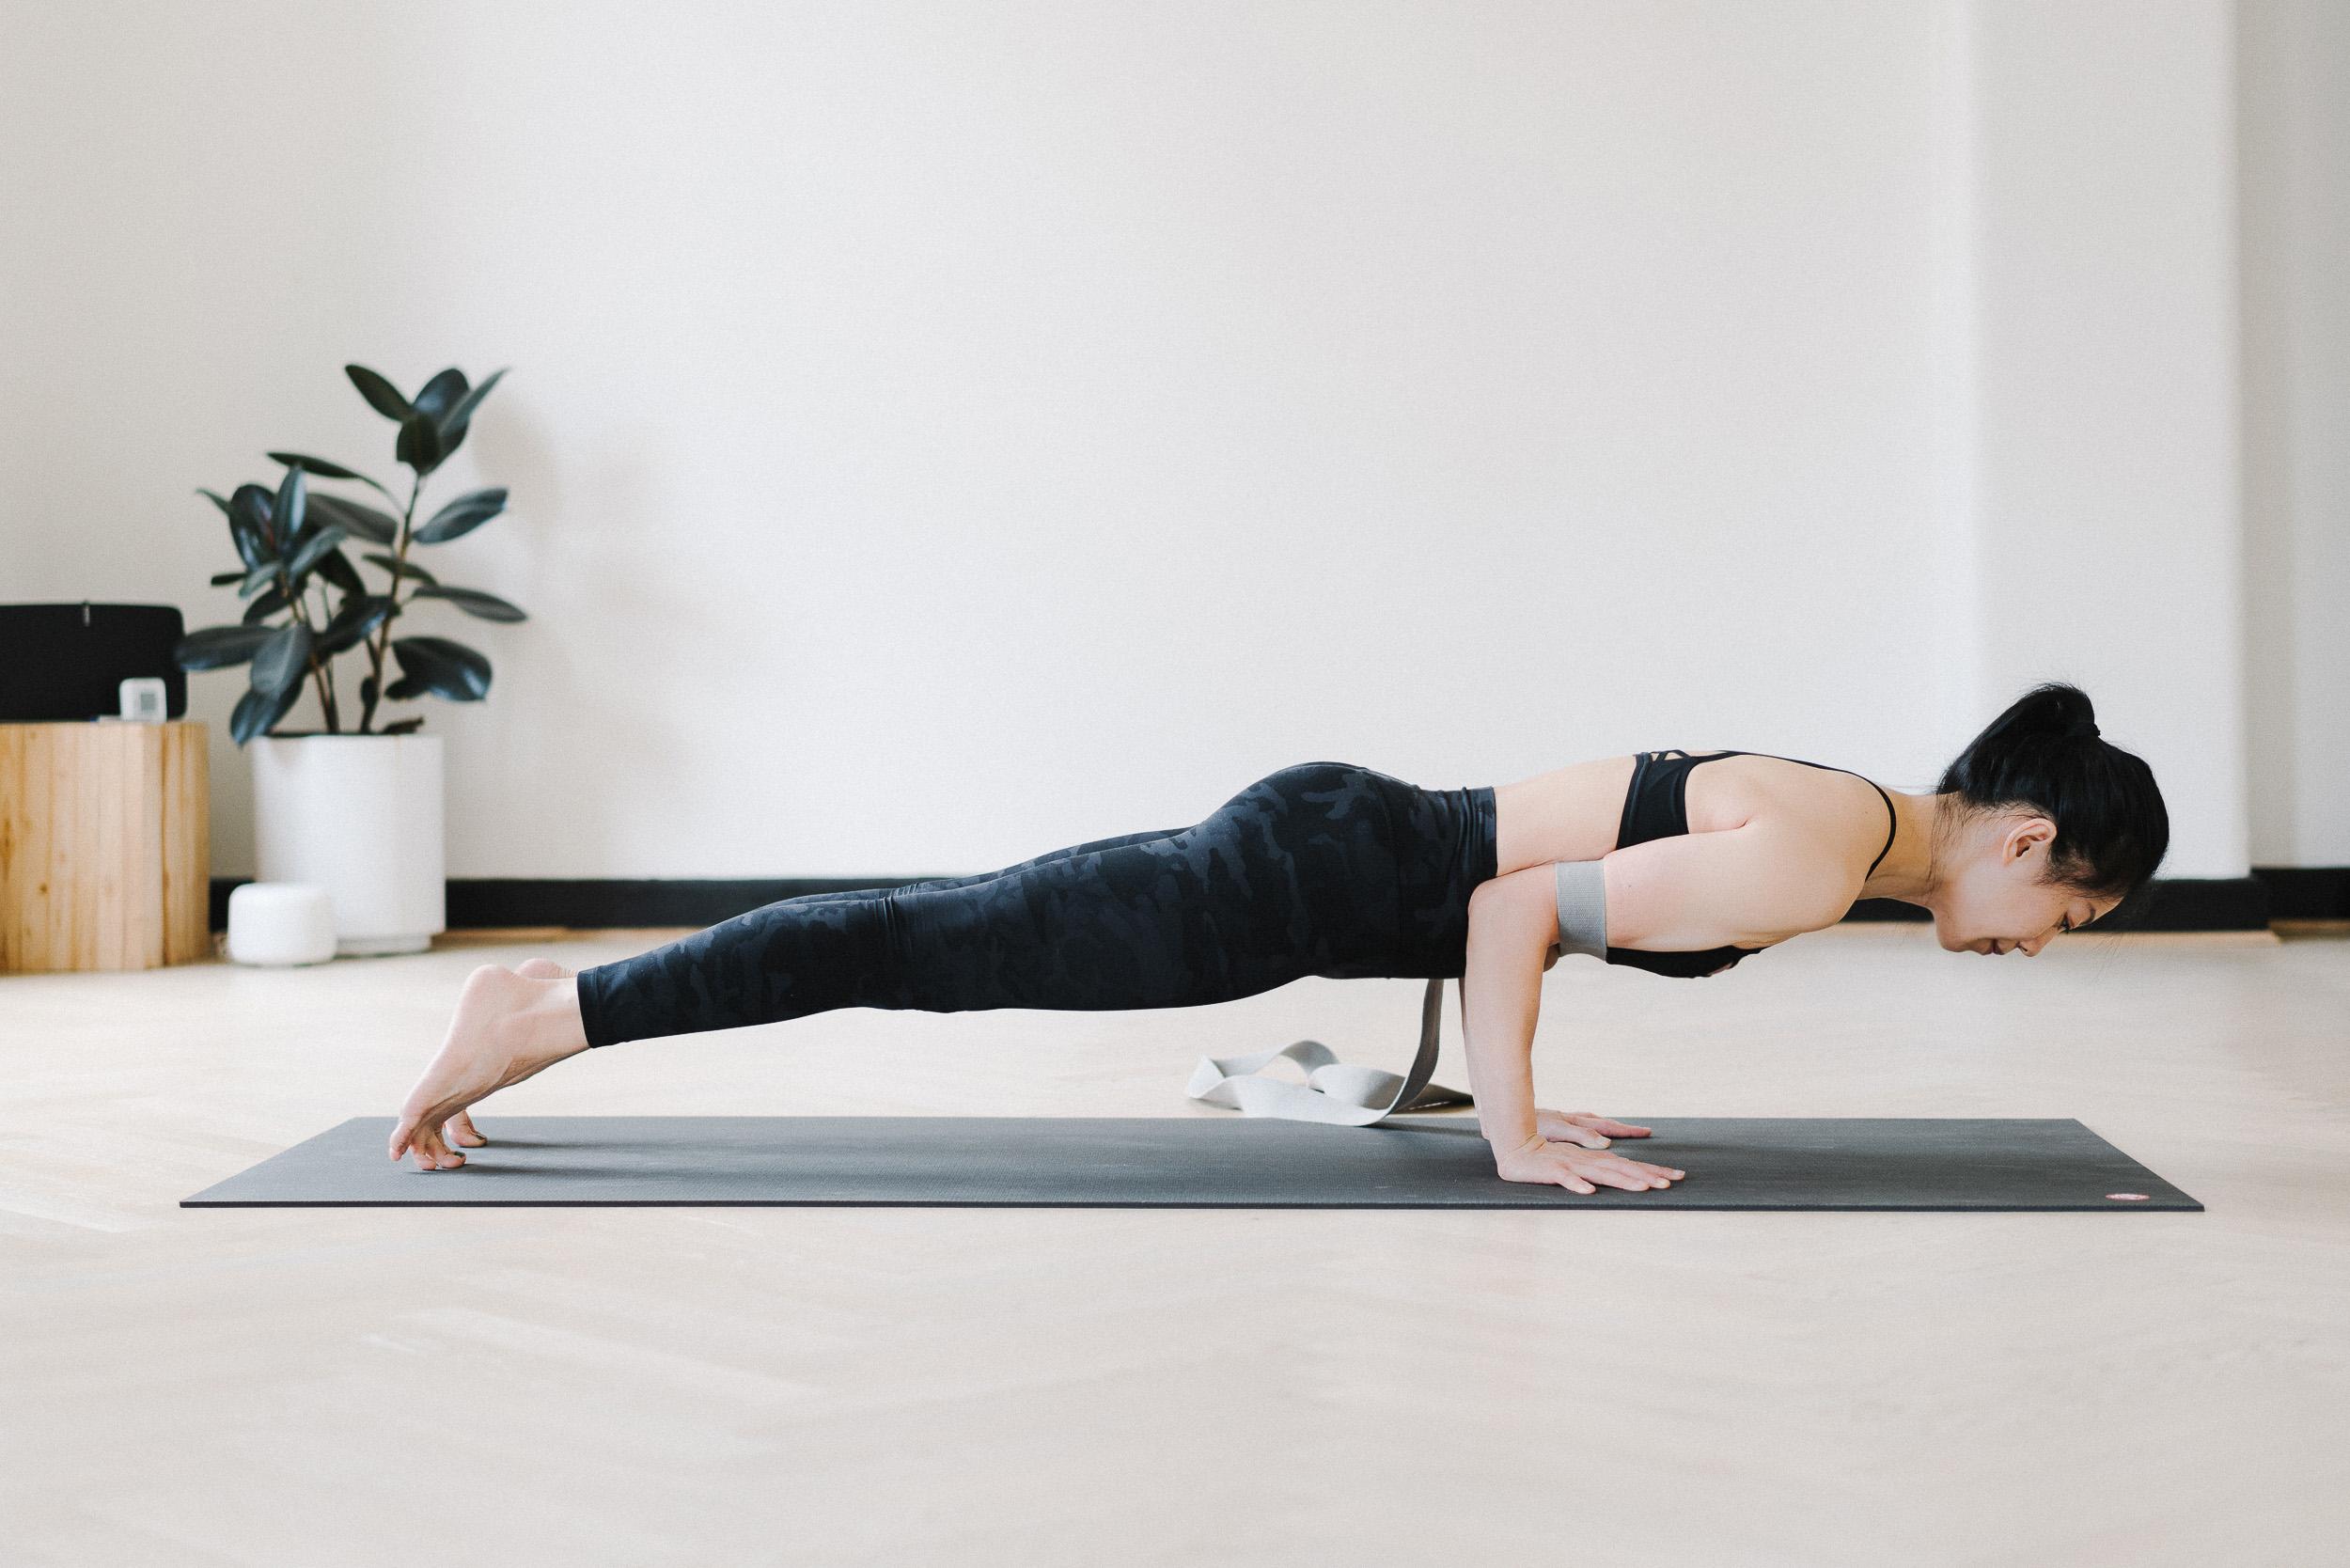 Little-Mandarin-Yoga-Studio jowing zhang.jpg